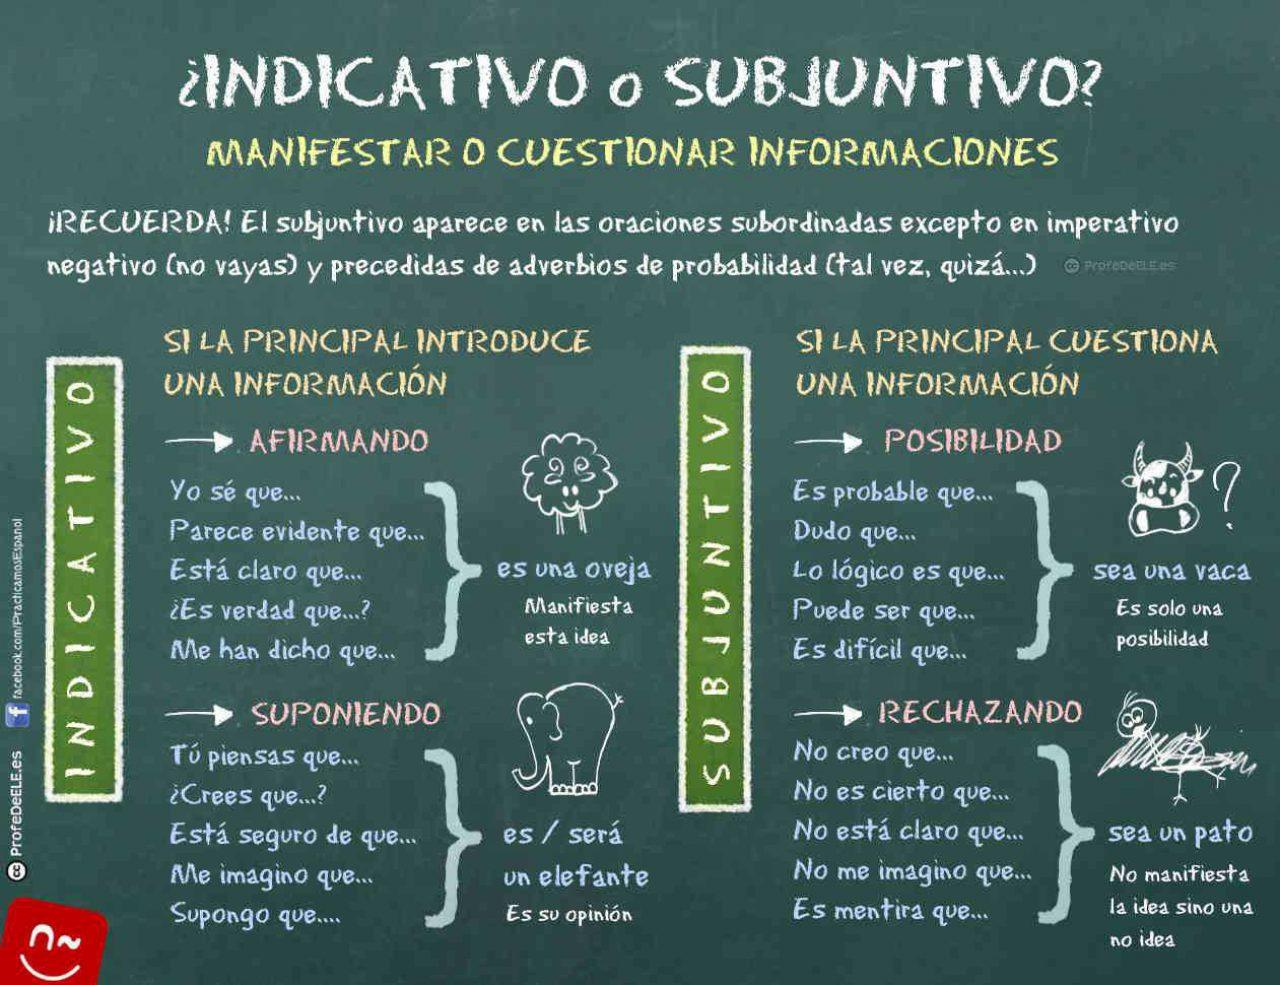 Subjuntivo Indicativo